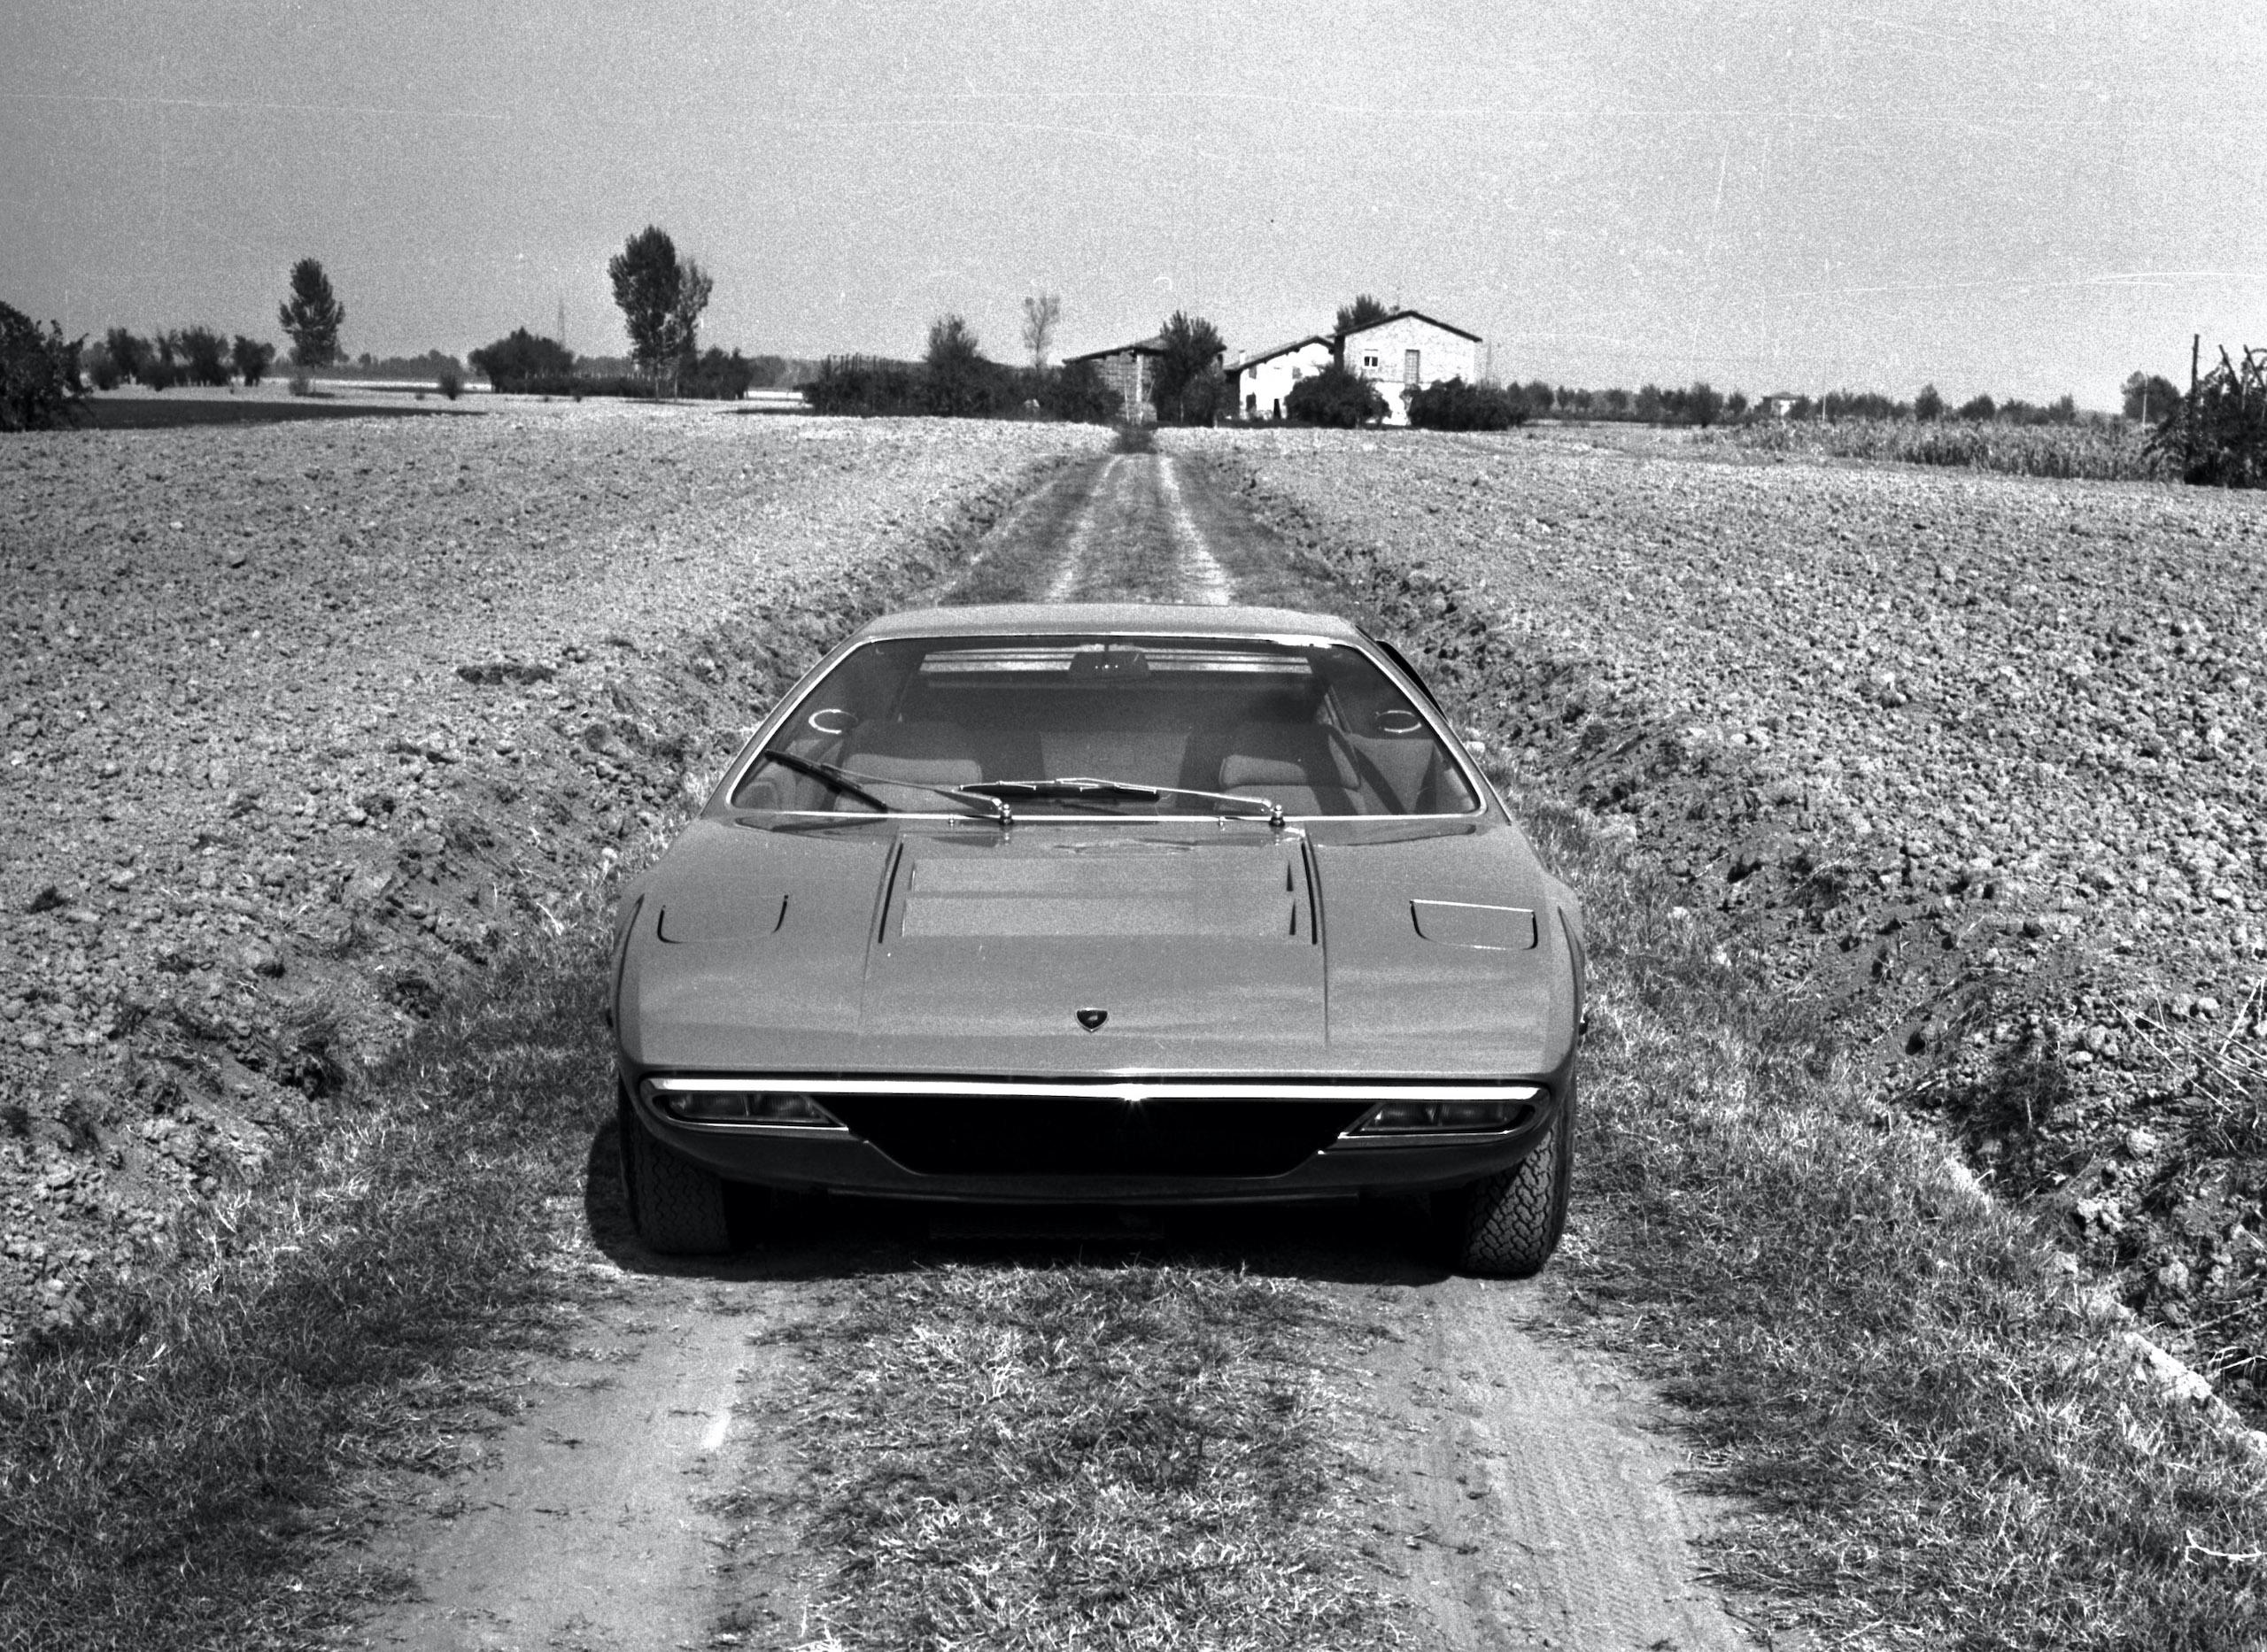 Lamborghini Urraco front vintage countryside photo